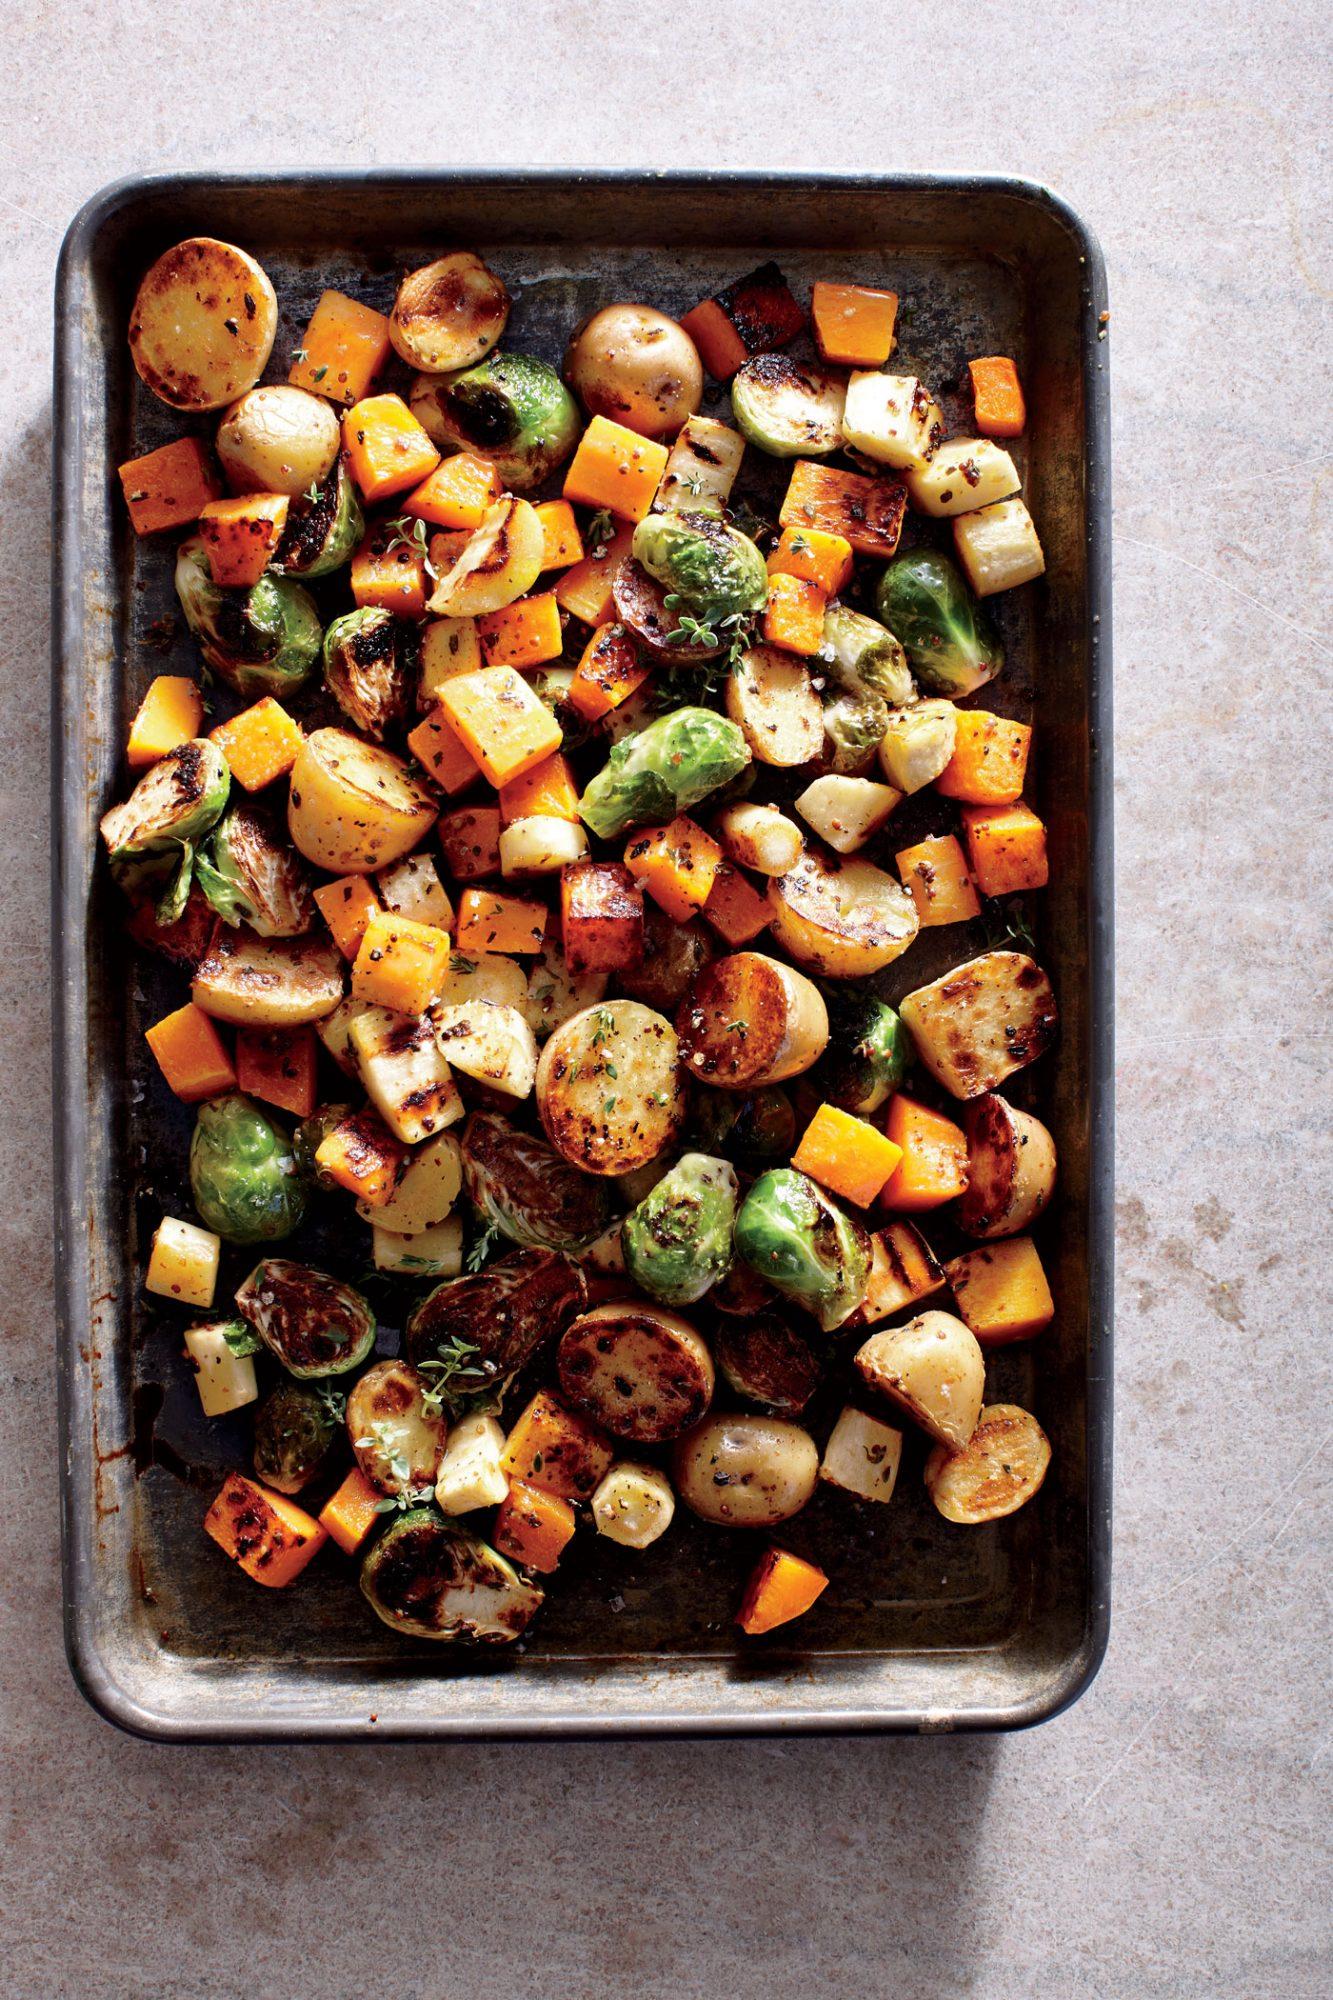 The Secret to Extra-Crispy Roasted Vegetables